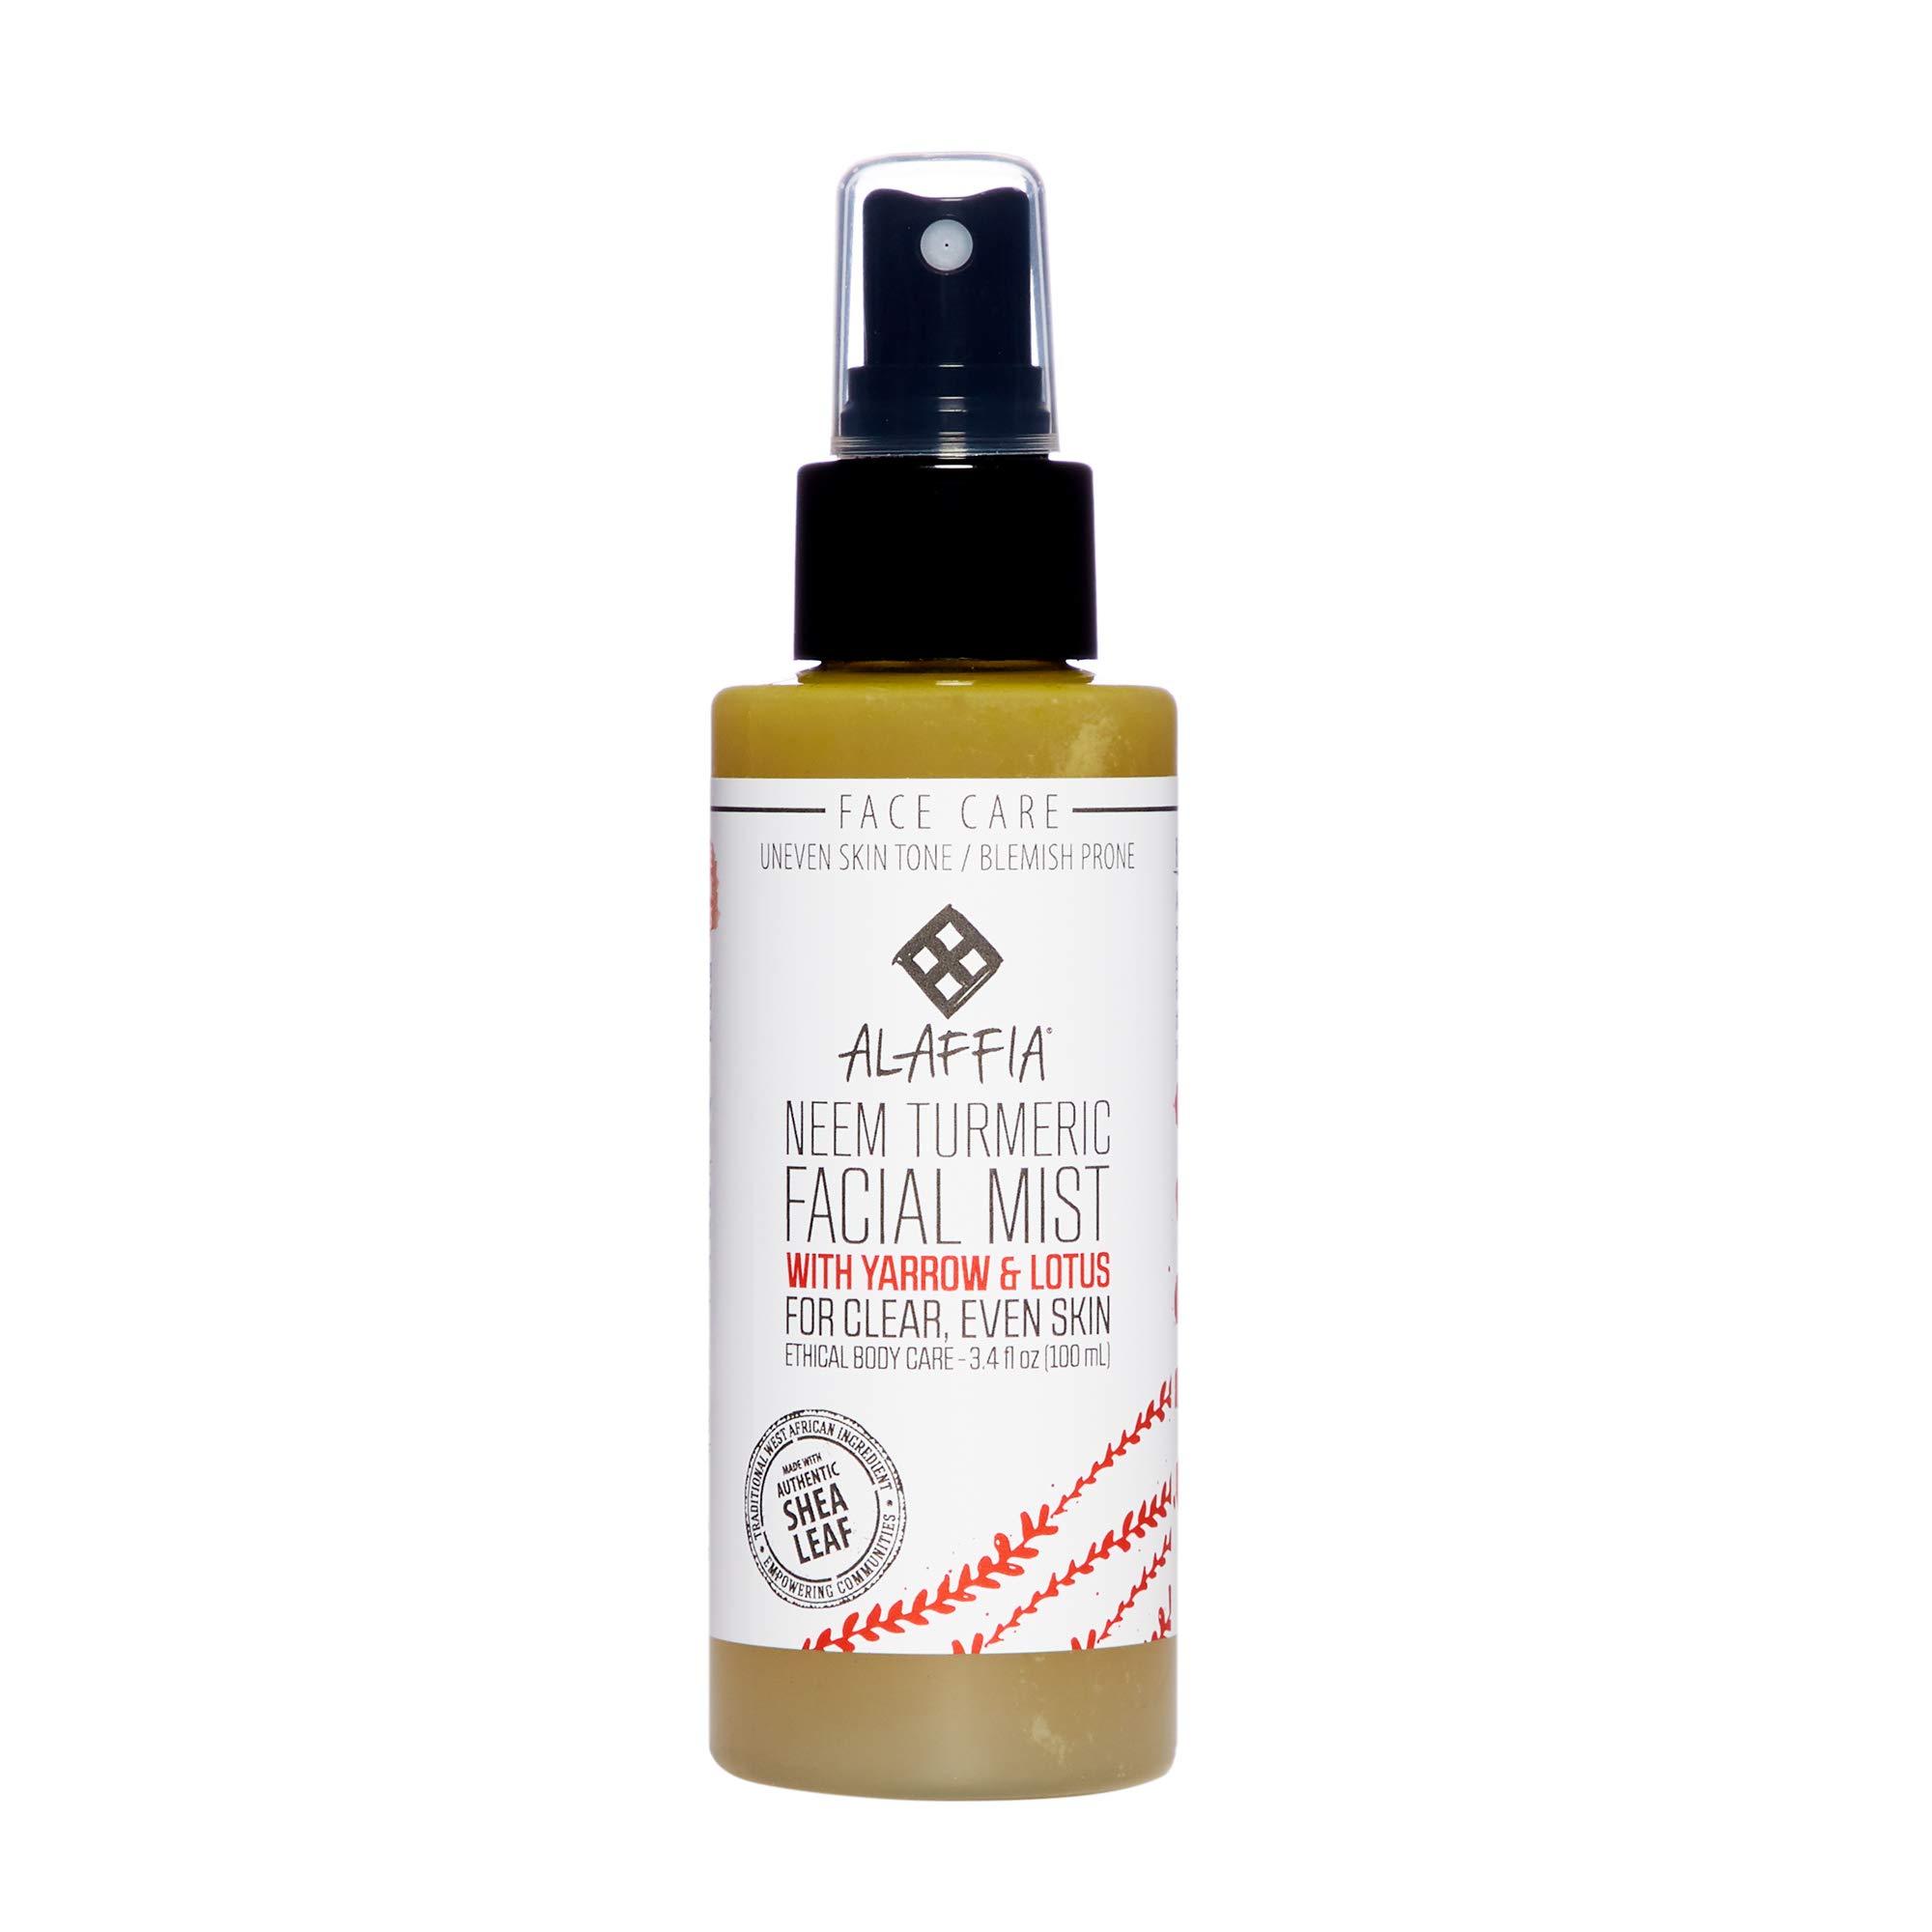 Alaffia - Neem Turmeric Harmonizing Facial Mist, Helps Tone and Restore Protective the Skin's Protective Layers with Red Algae, Yarrow, and Tea Tree, Fair Trade, Harmonizing Neem, 3.4 Ounces